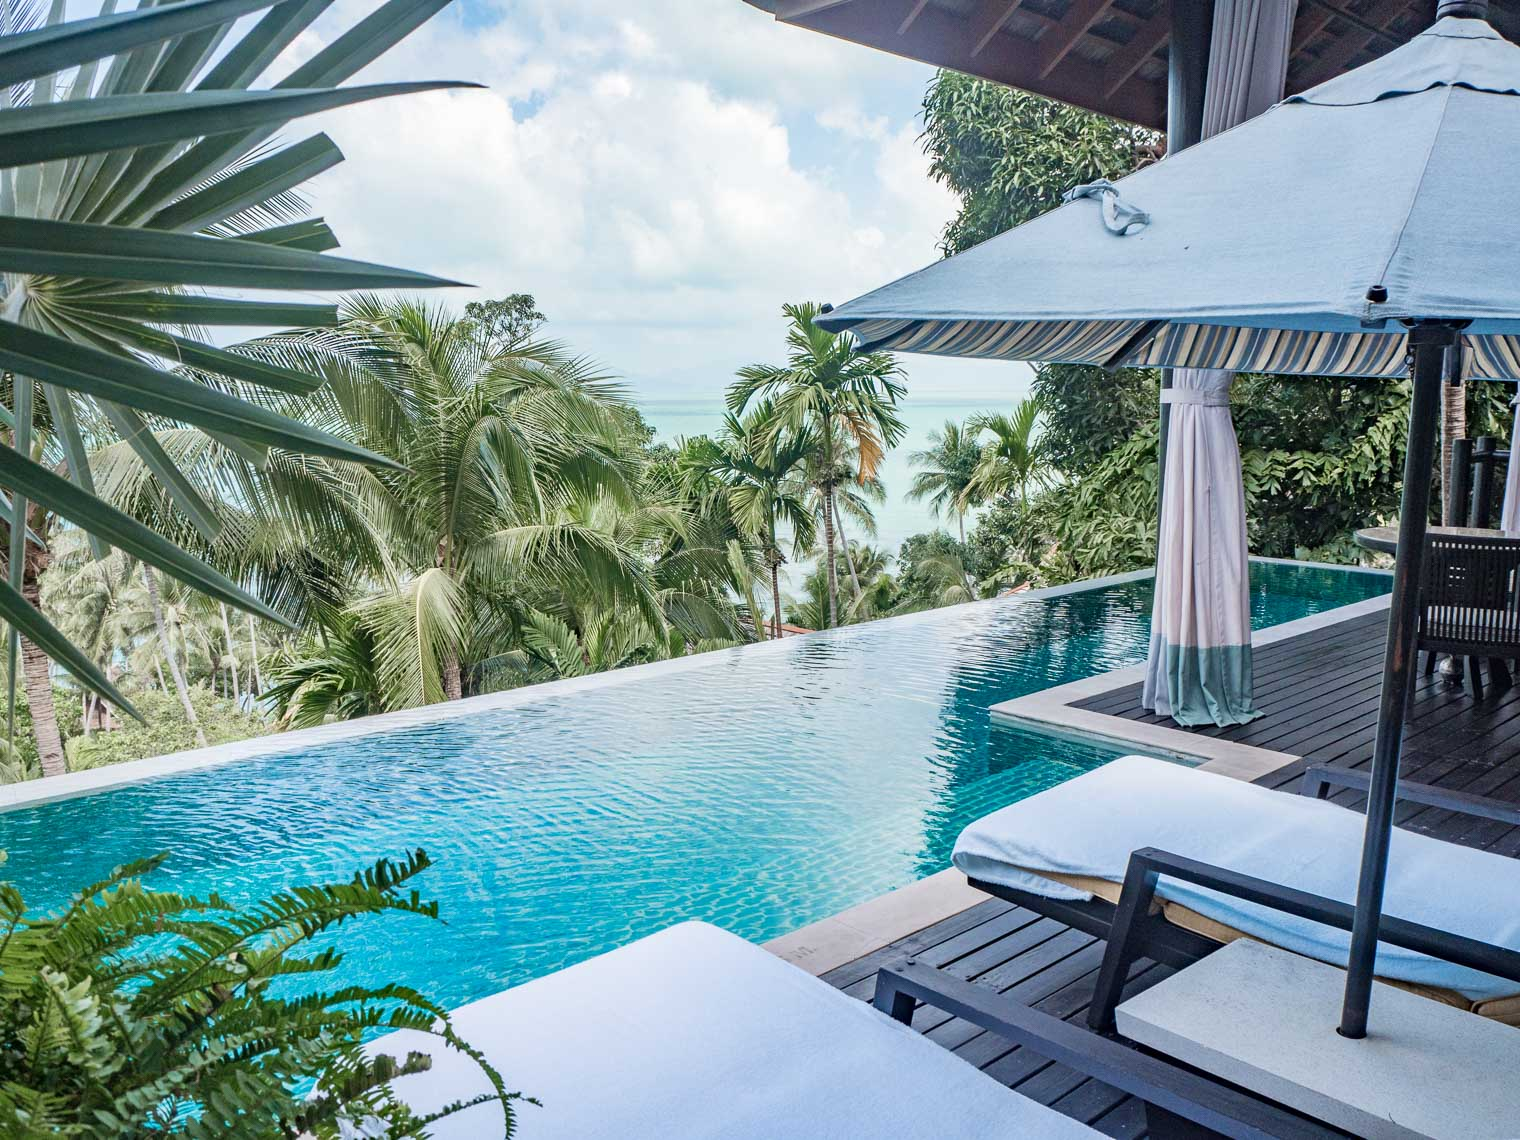 Four Seasons Koh Samui Thailand private villa pool